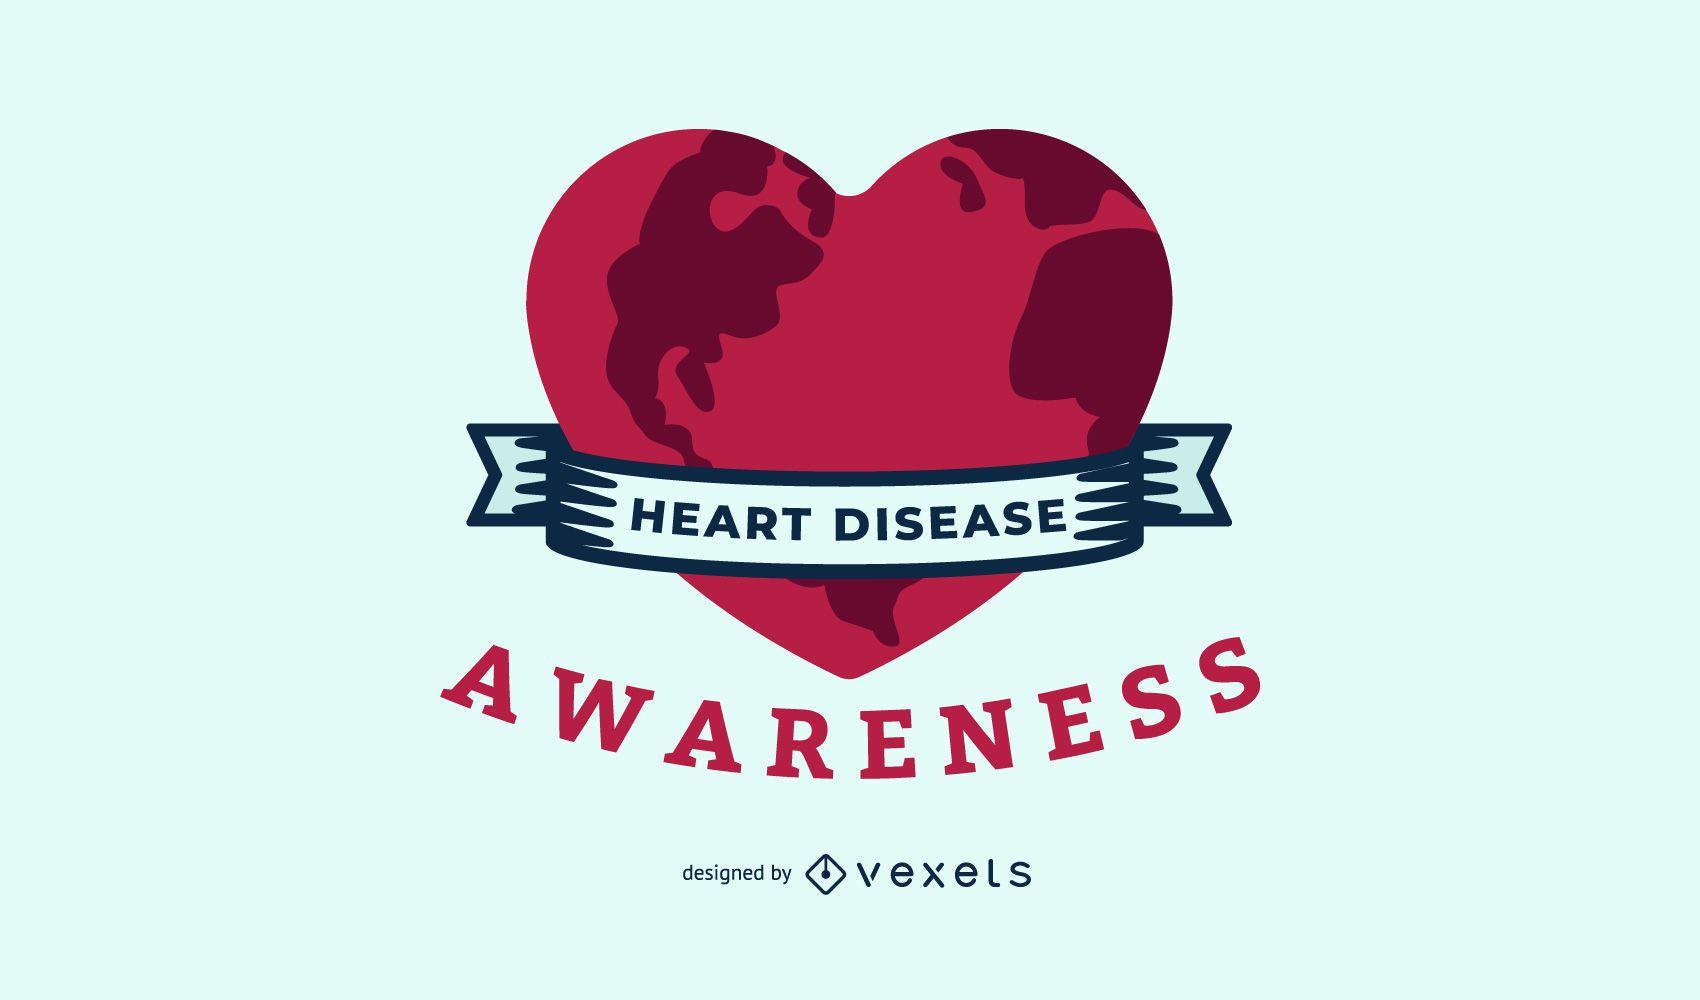 Heart Disease Awareness Illustration